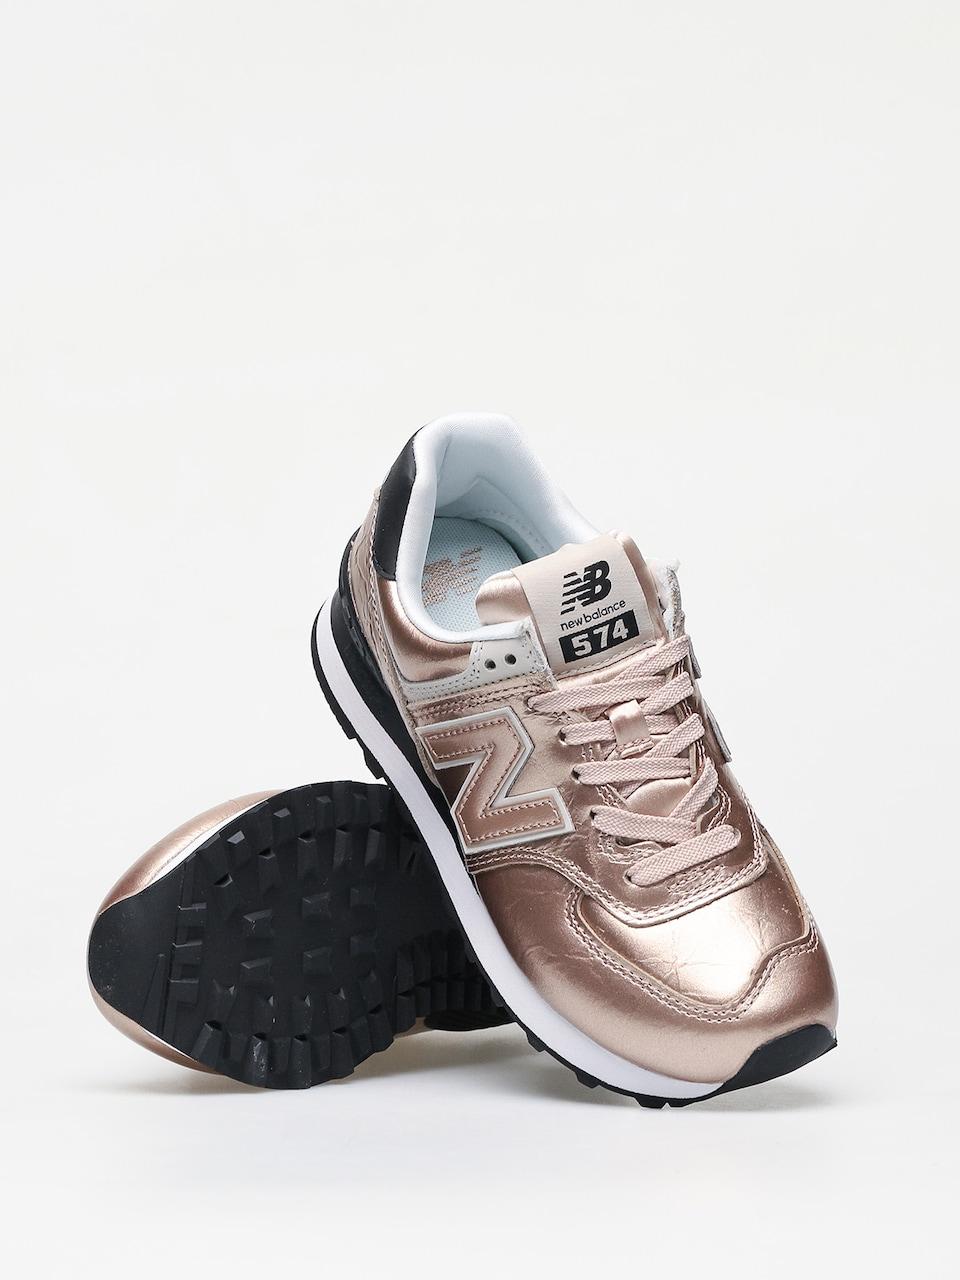 new balance 574 gold